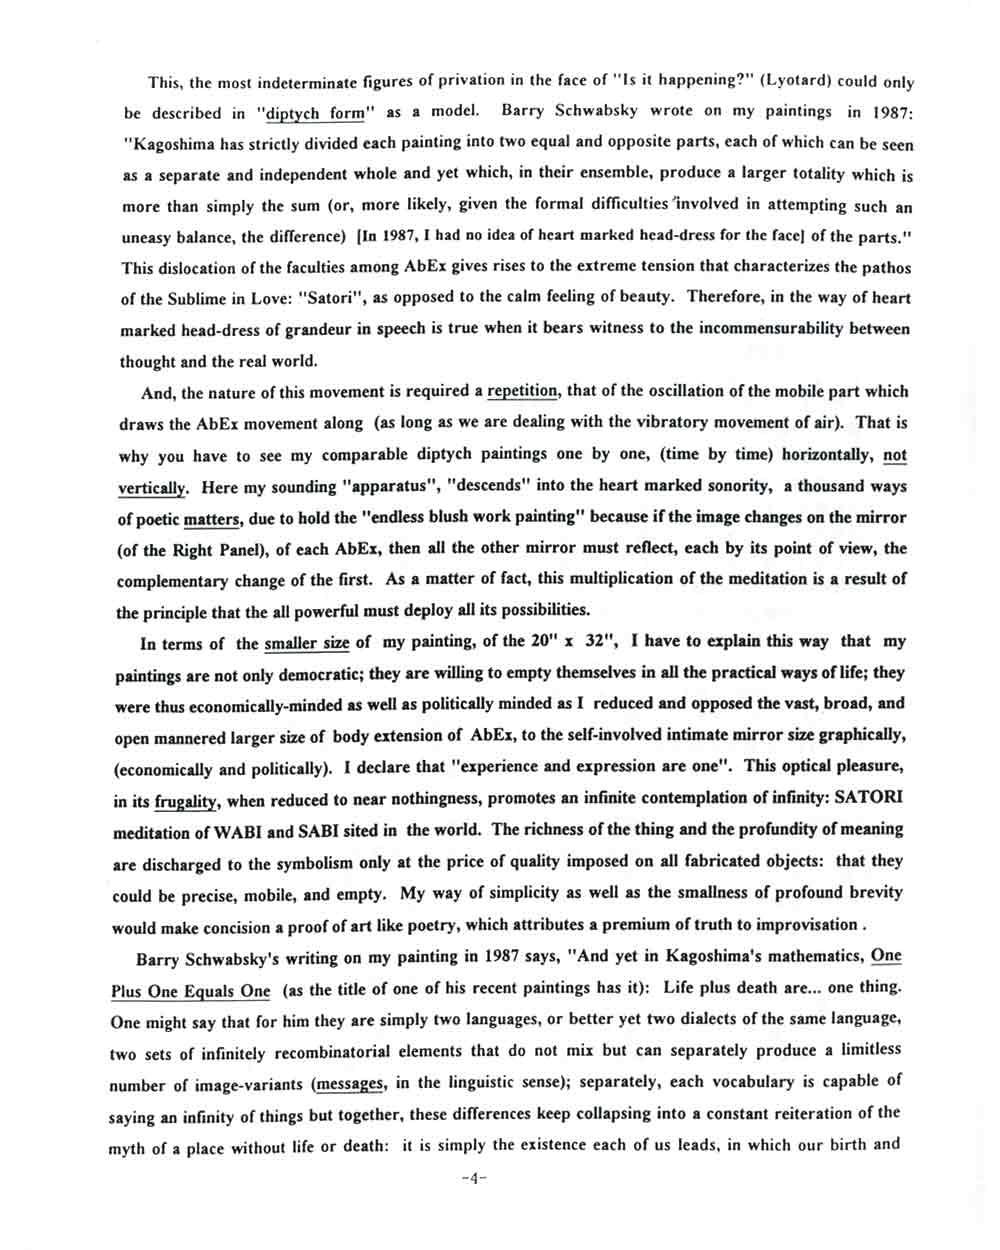 Rocky Kagoshima's Artist Statement, pg 4